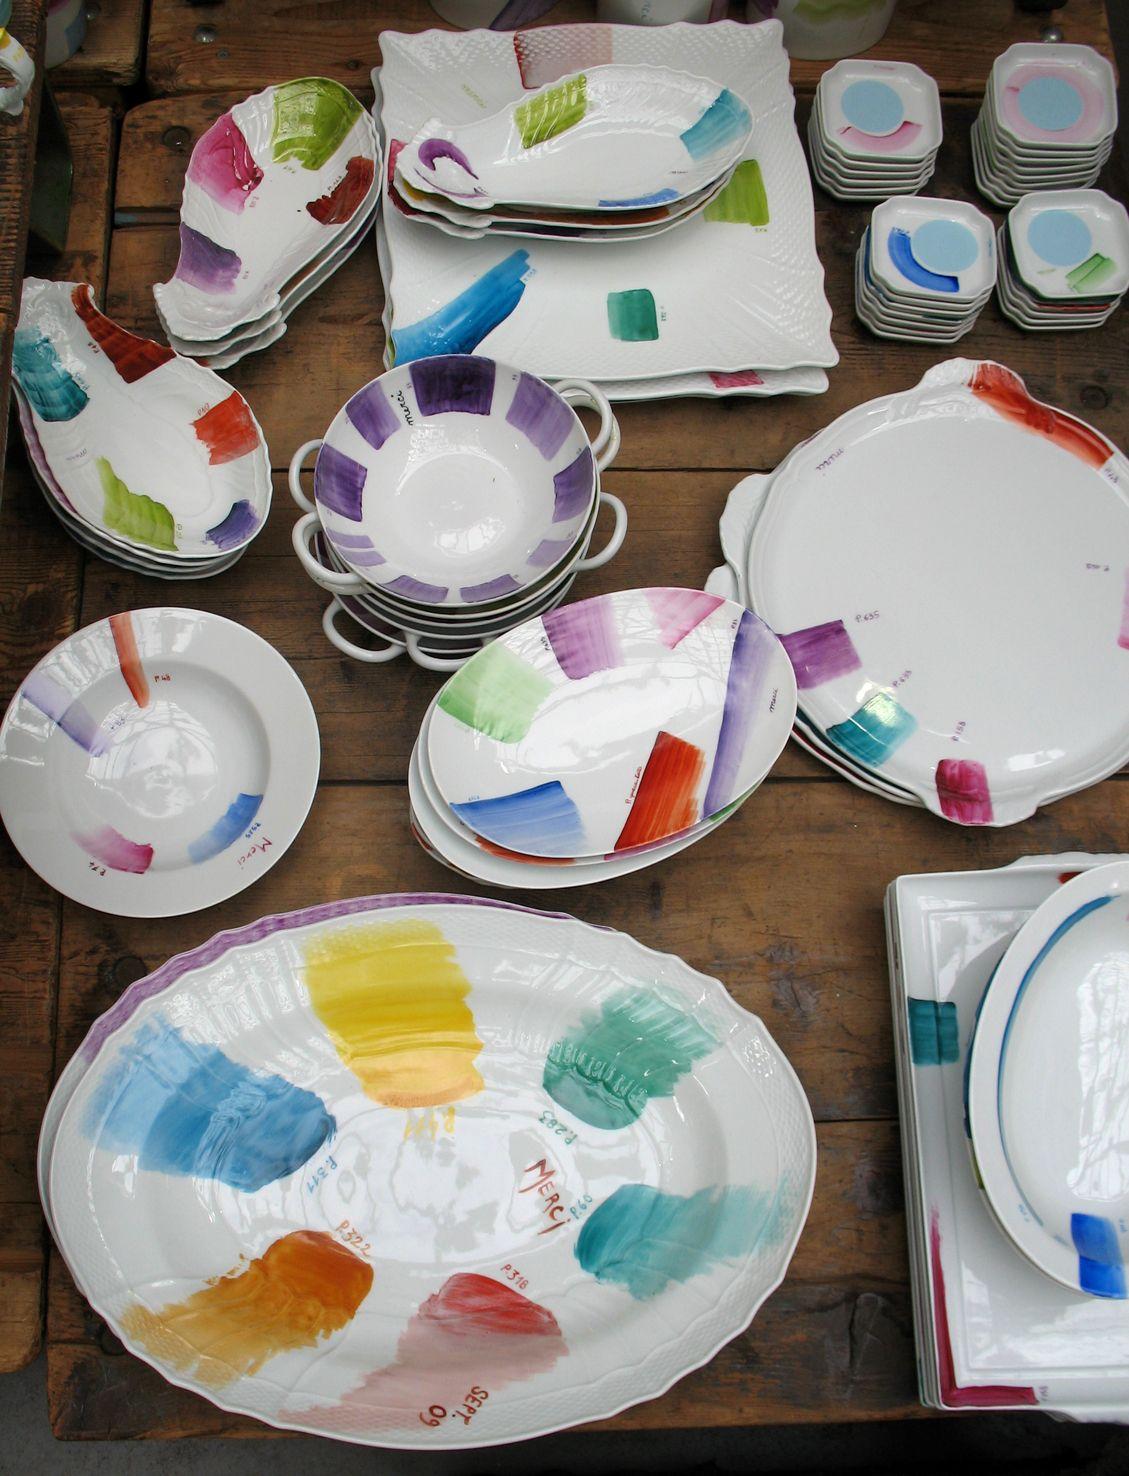 Richard Ginori plates - by Paola Navone u0027one offu0027 at Merci ... & Richard Ginori plates - by Paola Navone: u0027one offu0027 at Merci Paris ...